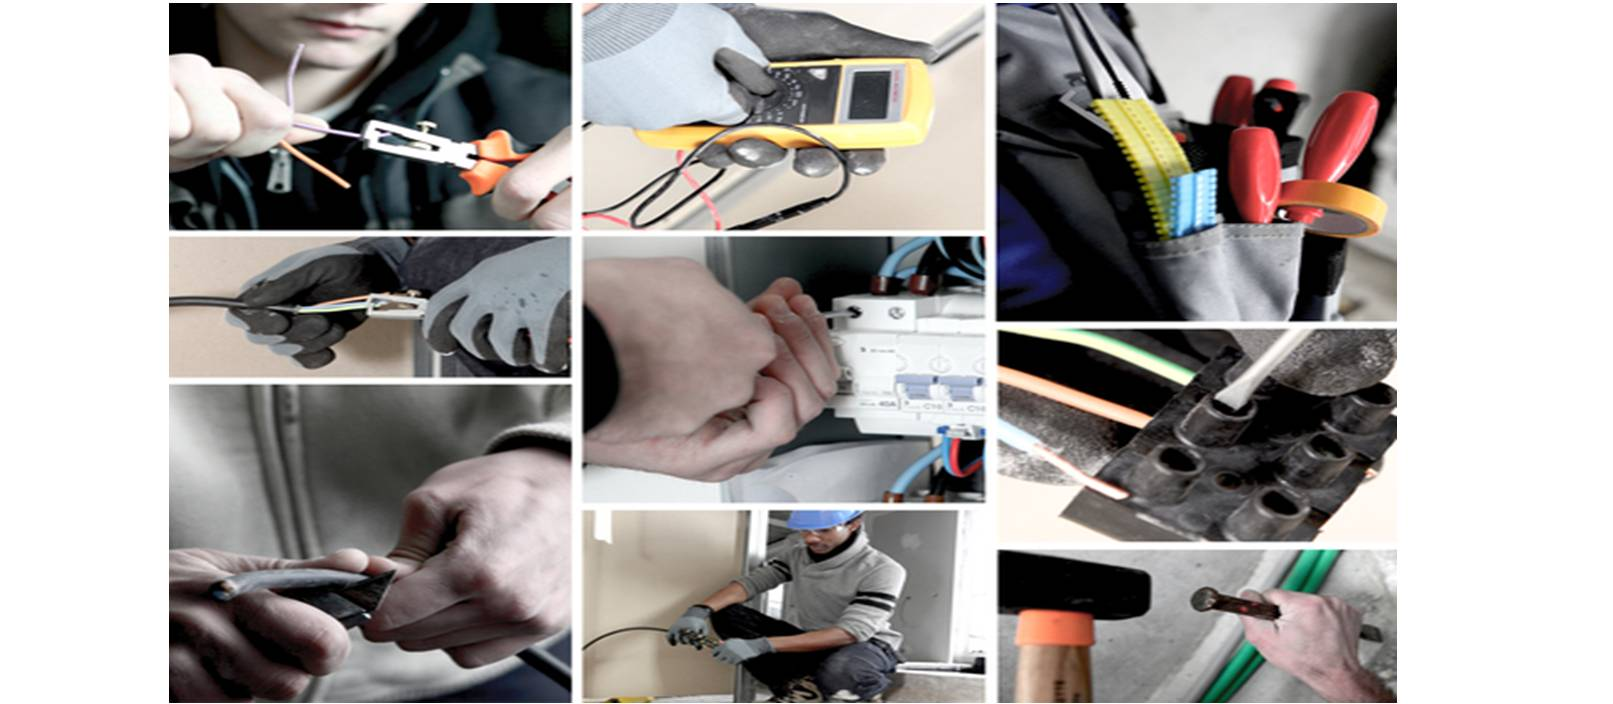 Stellenangebot Haustechnik: Elektriker